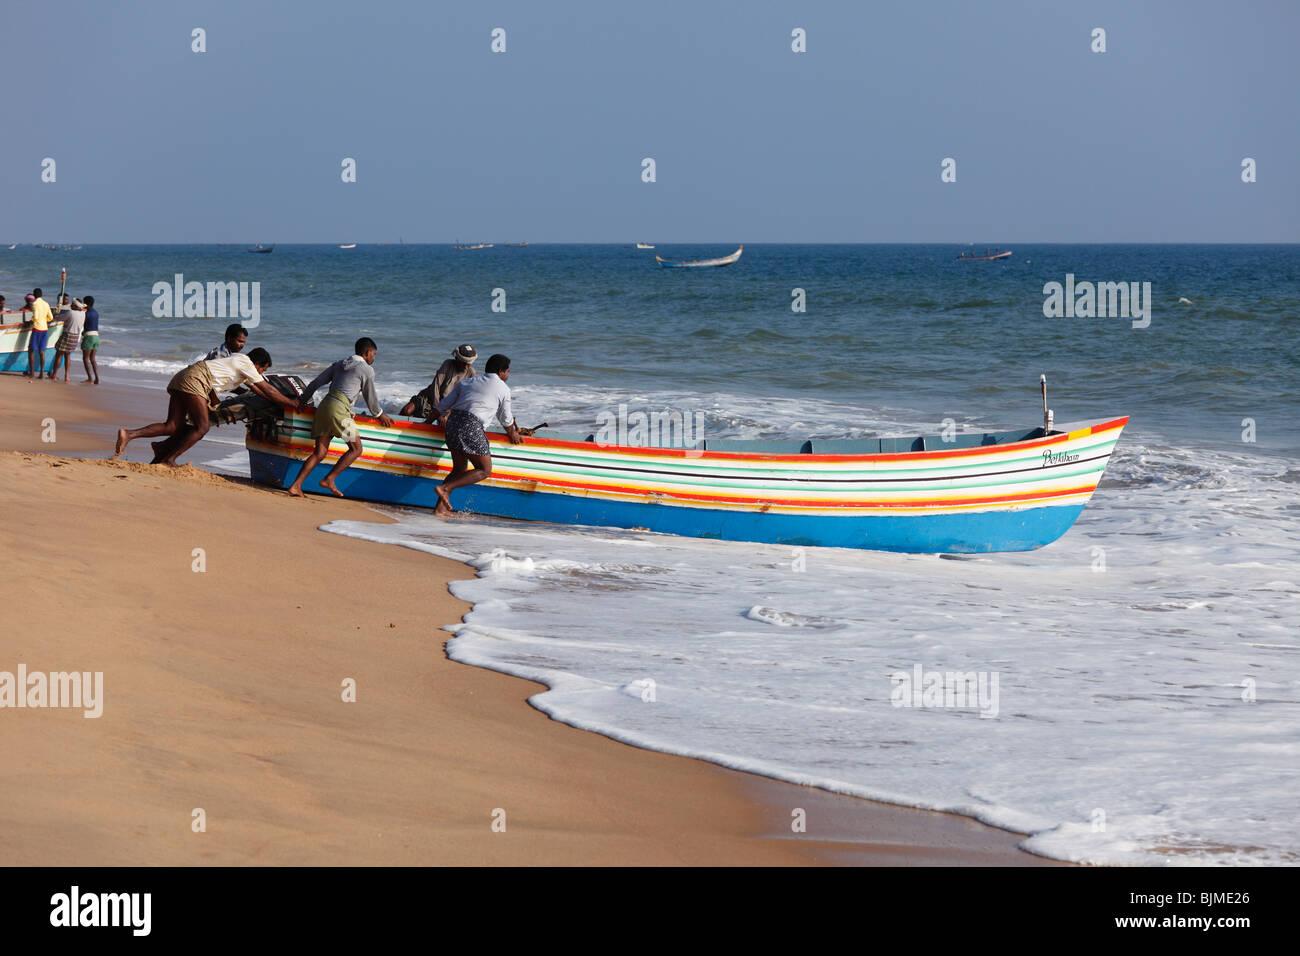 Fishermen pushing their fishing boat into the sea, Somatheeram Beach, Malabarian Coast, Malabar, Kerala state, India, - Stock Image